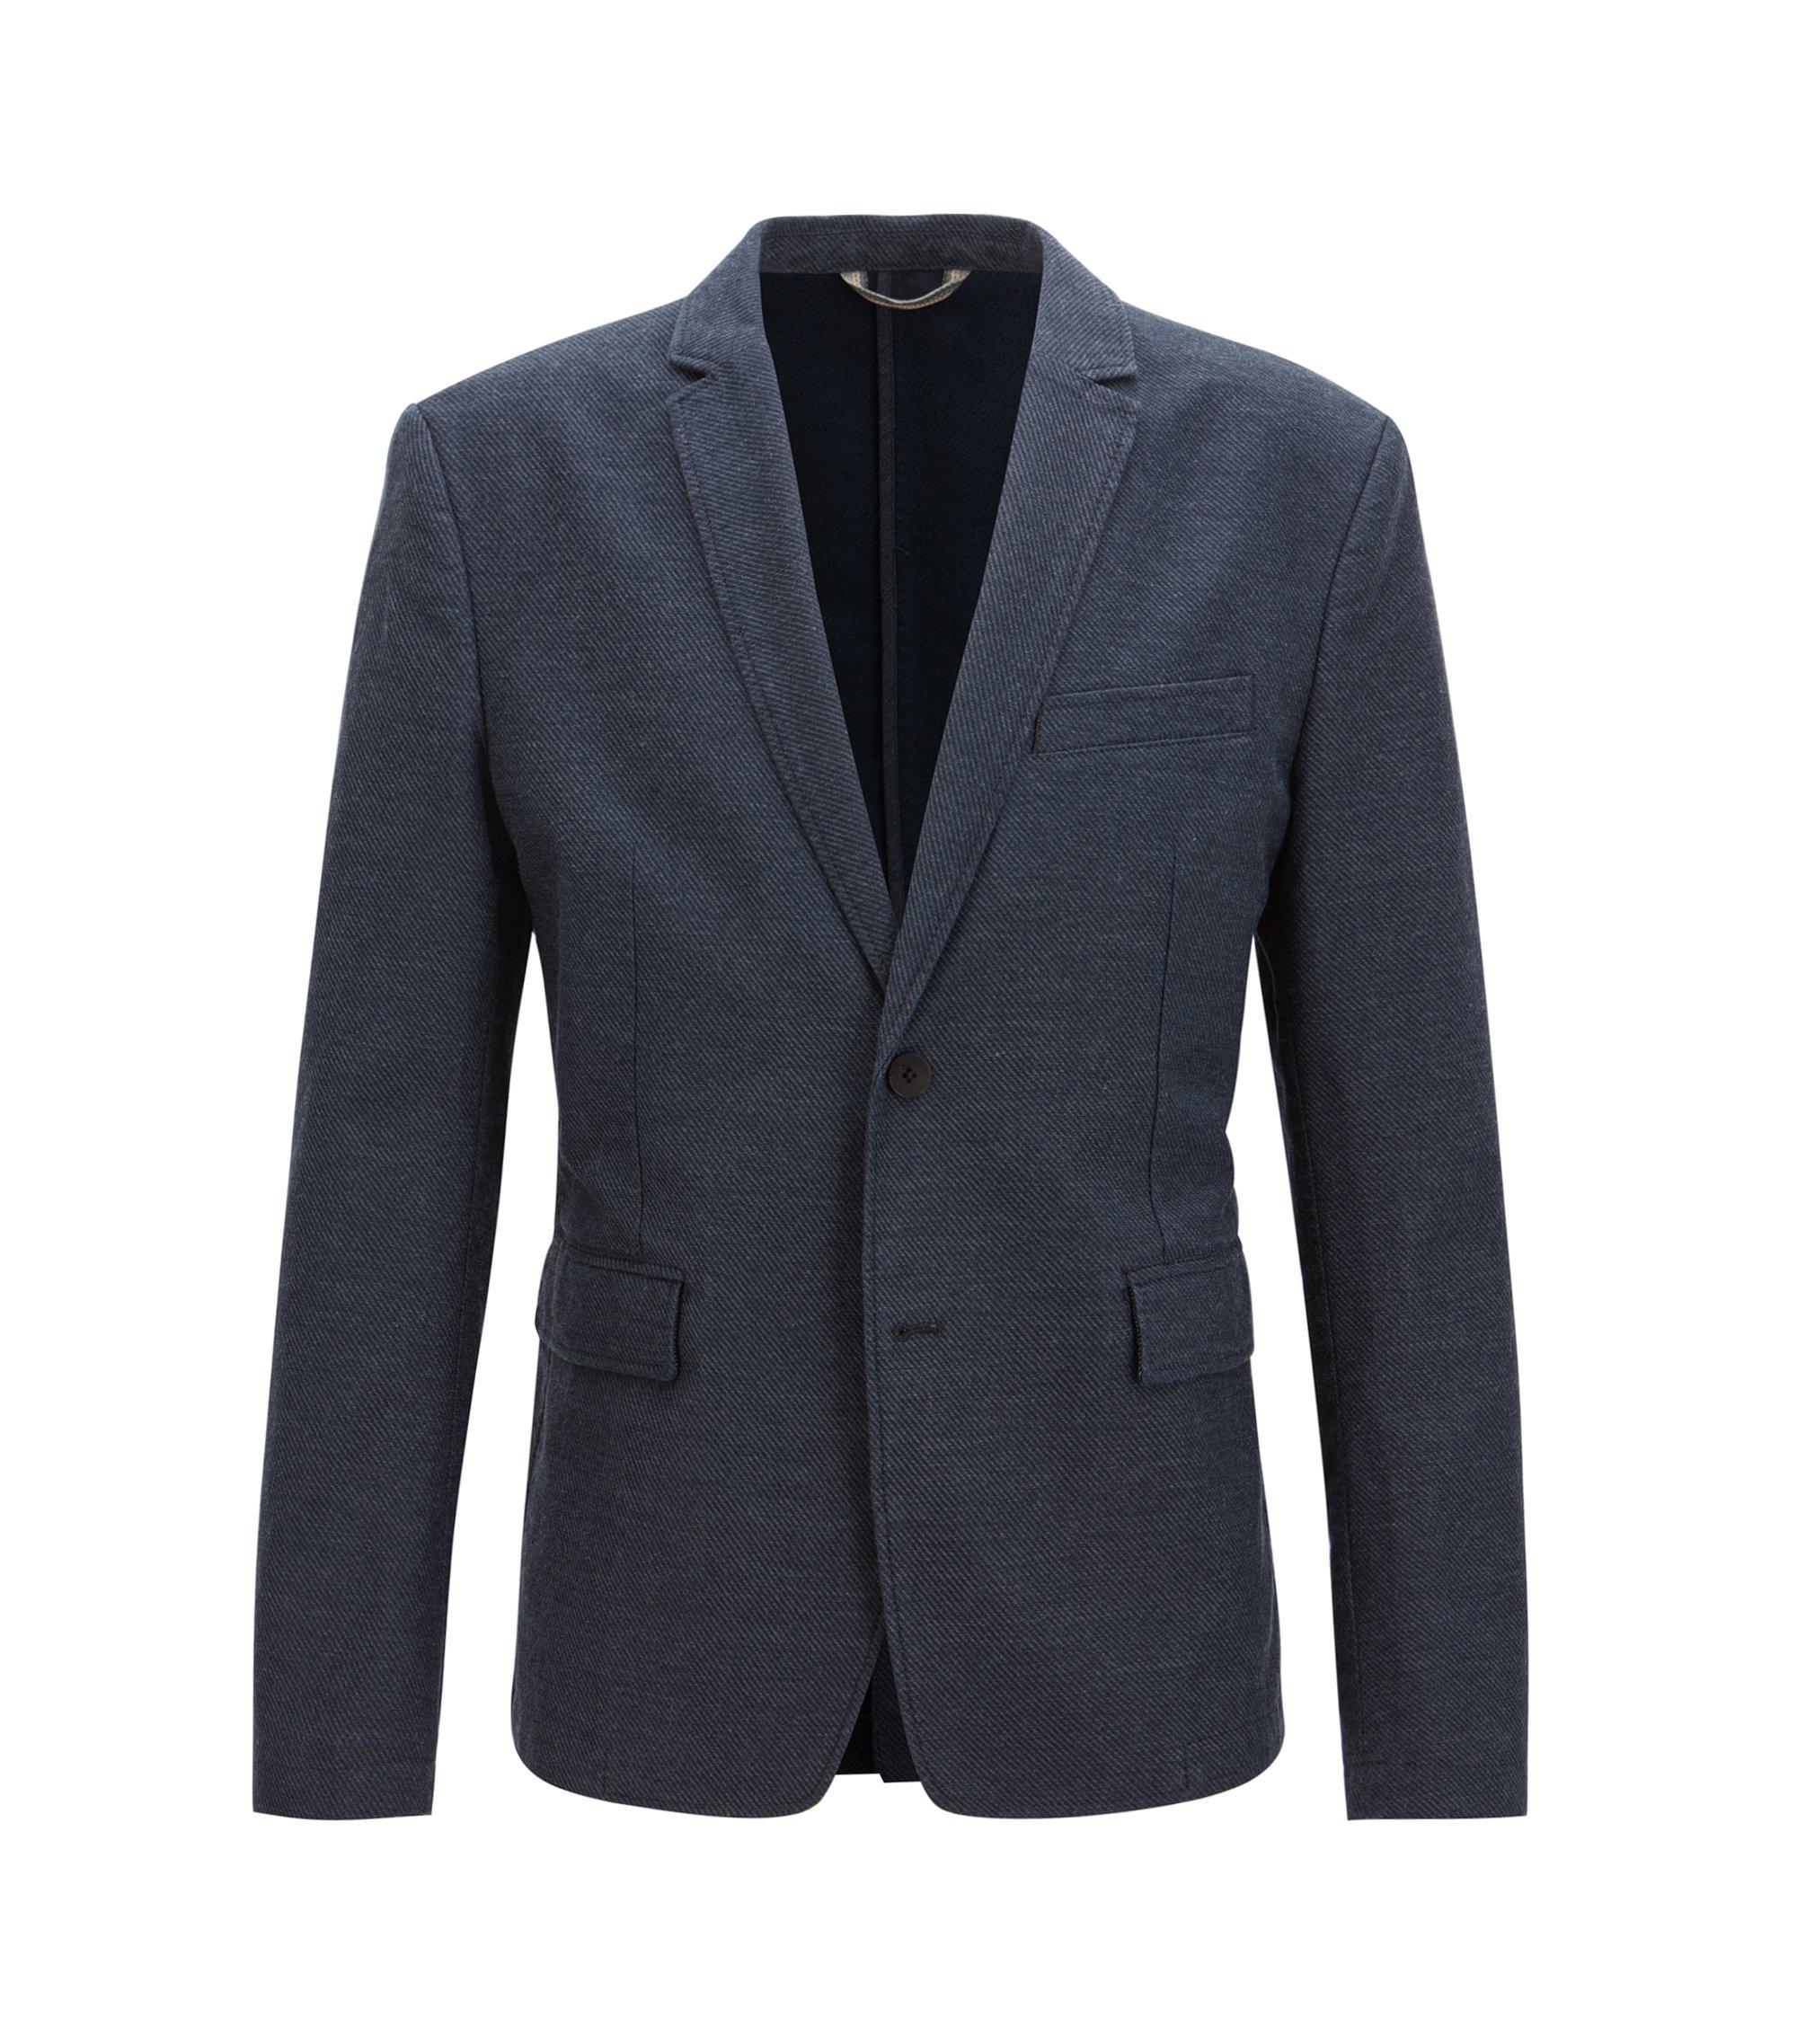 Twill Stretch Cotton Linen Sport Coat, Slim Fit | Bedge BS W, Dark Blue